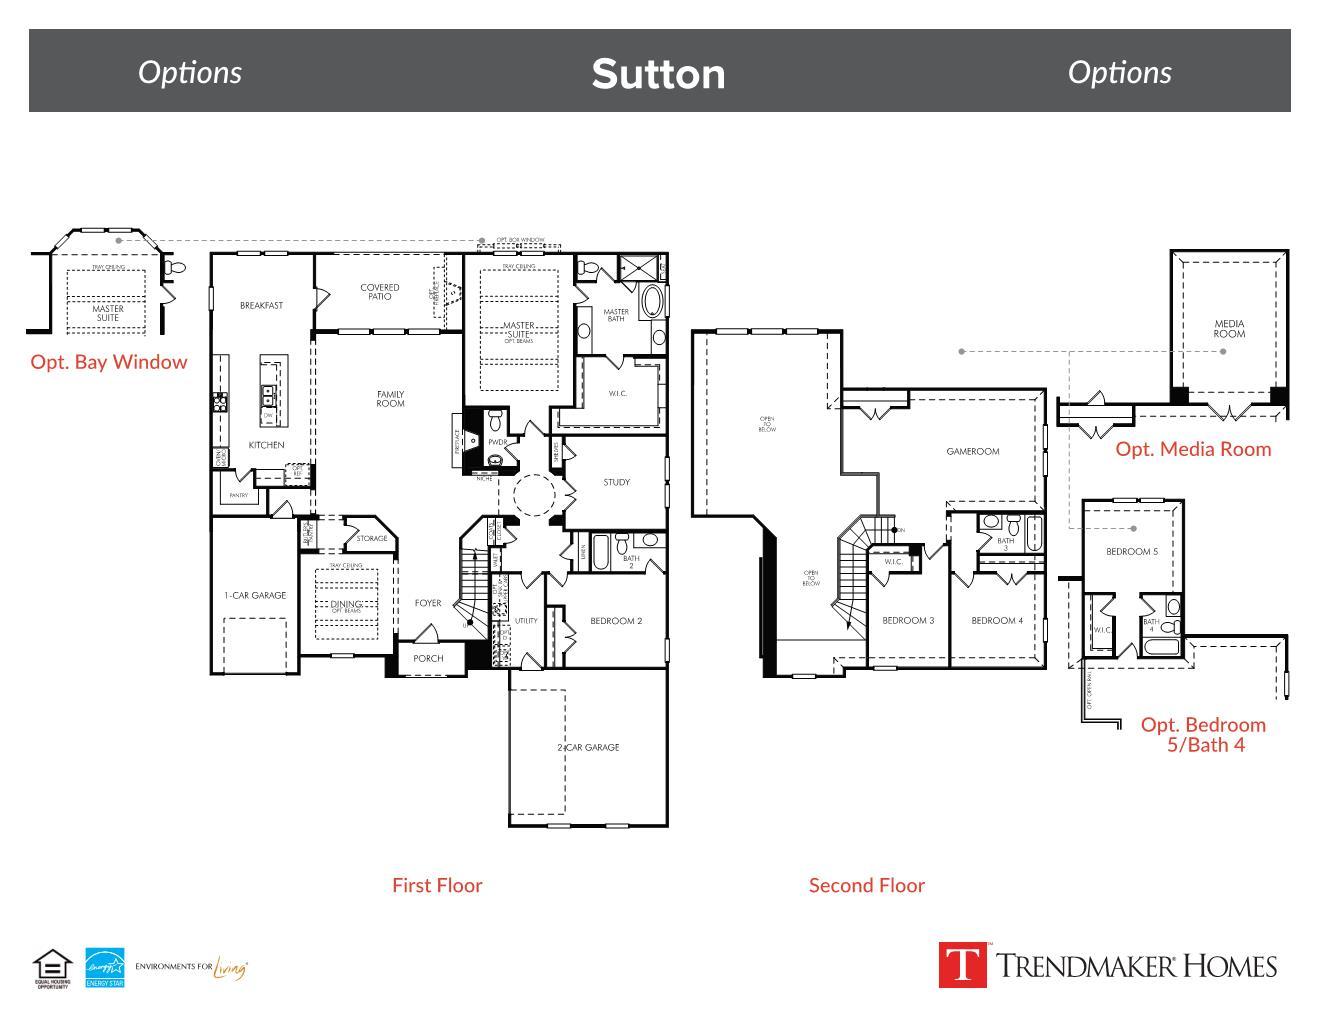 Sutton floor plan - Miramonte